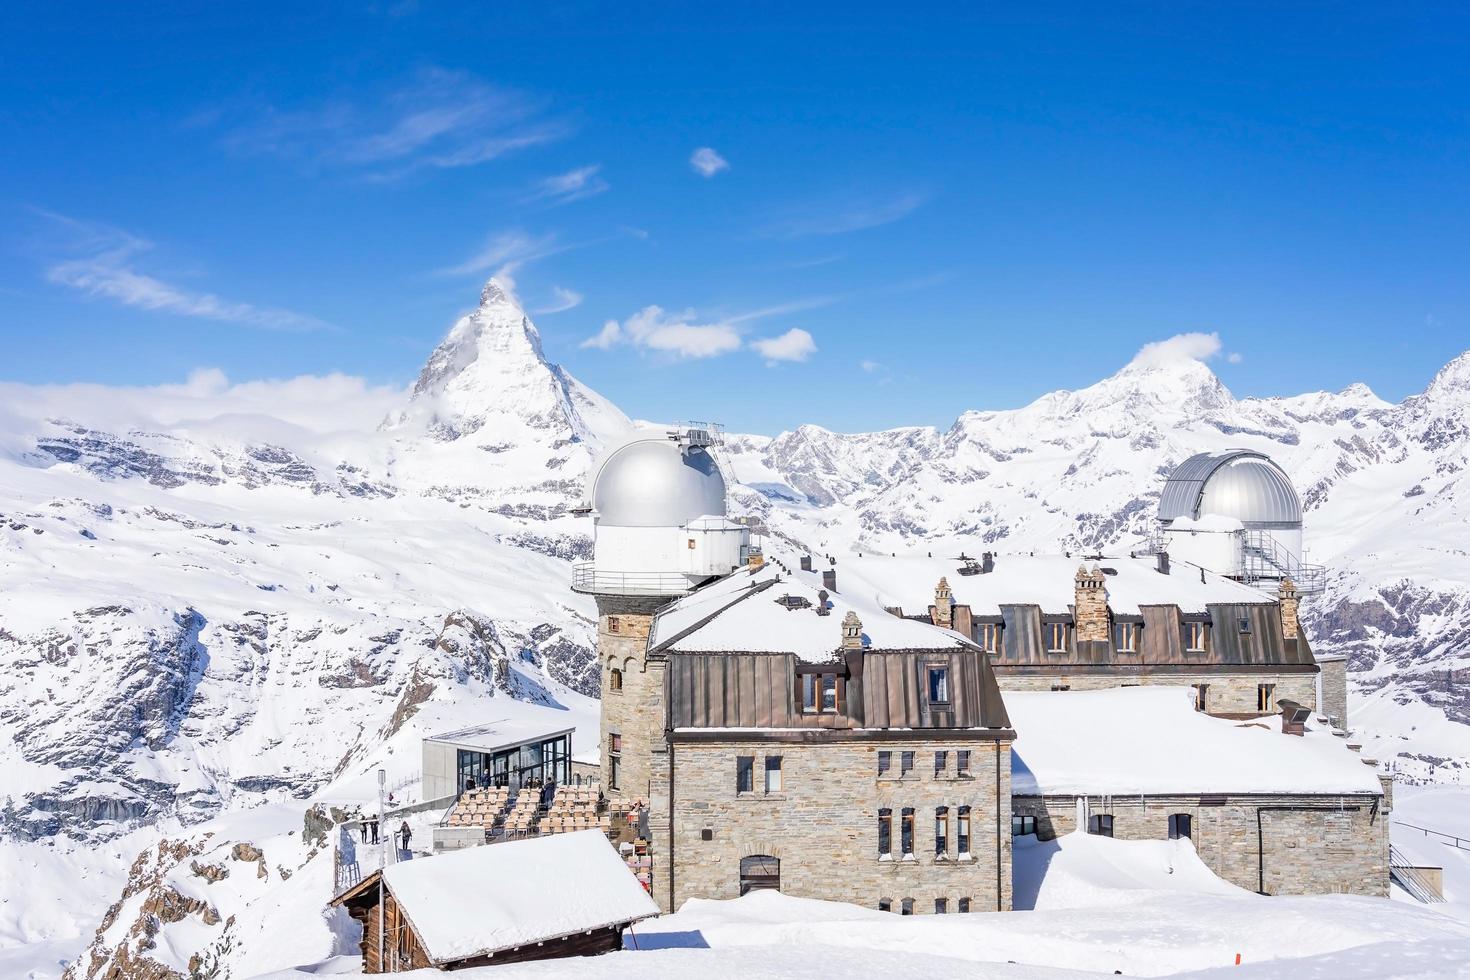 l'observatoire du sommet du Gornergrat en suisse, 2018 photo